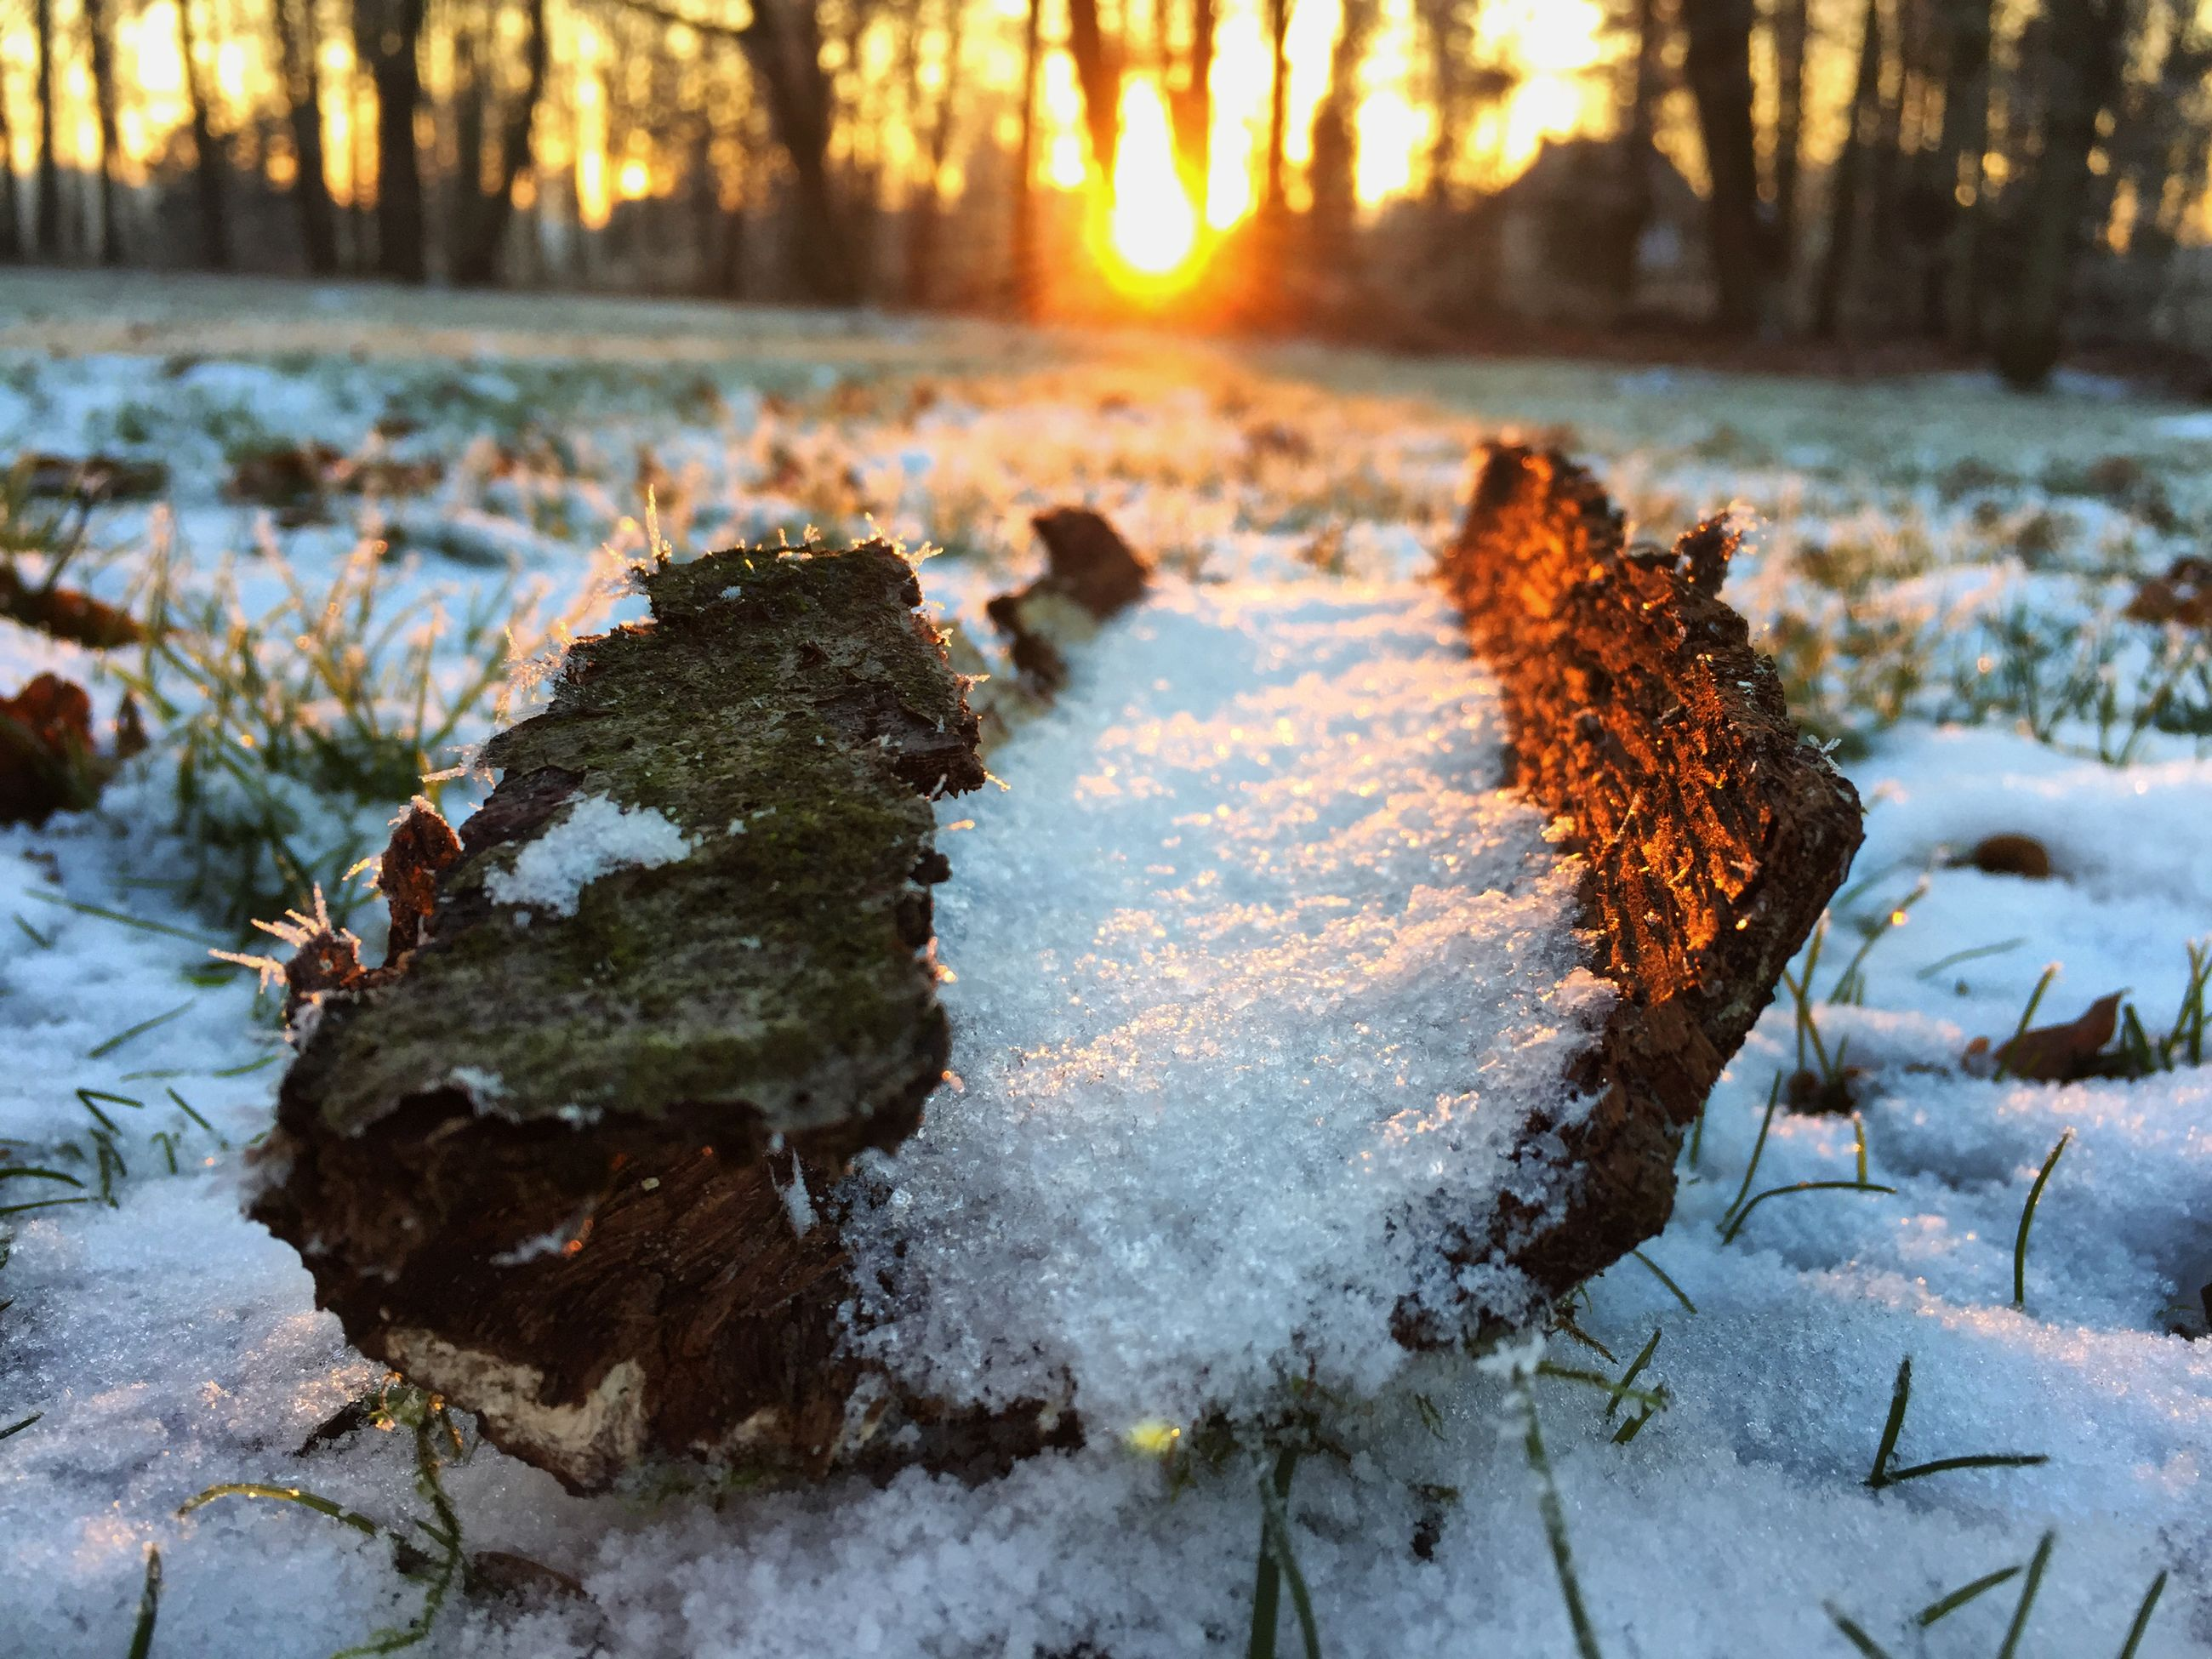 Snow On Driftwood During Sunset At Stadtpark Gutersloh